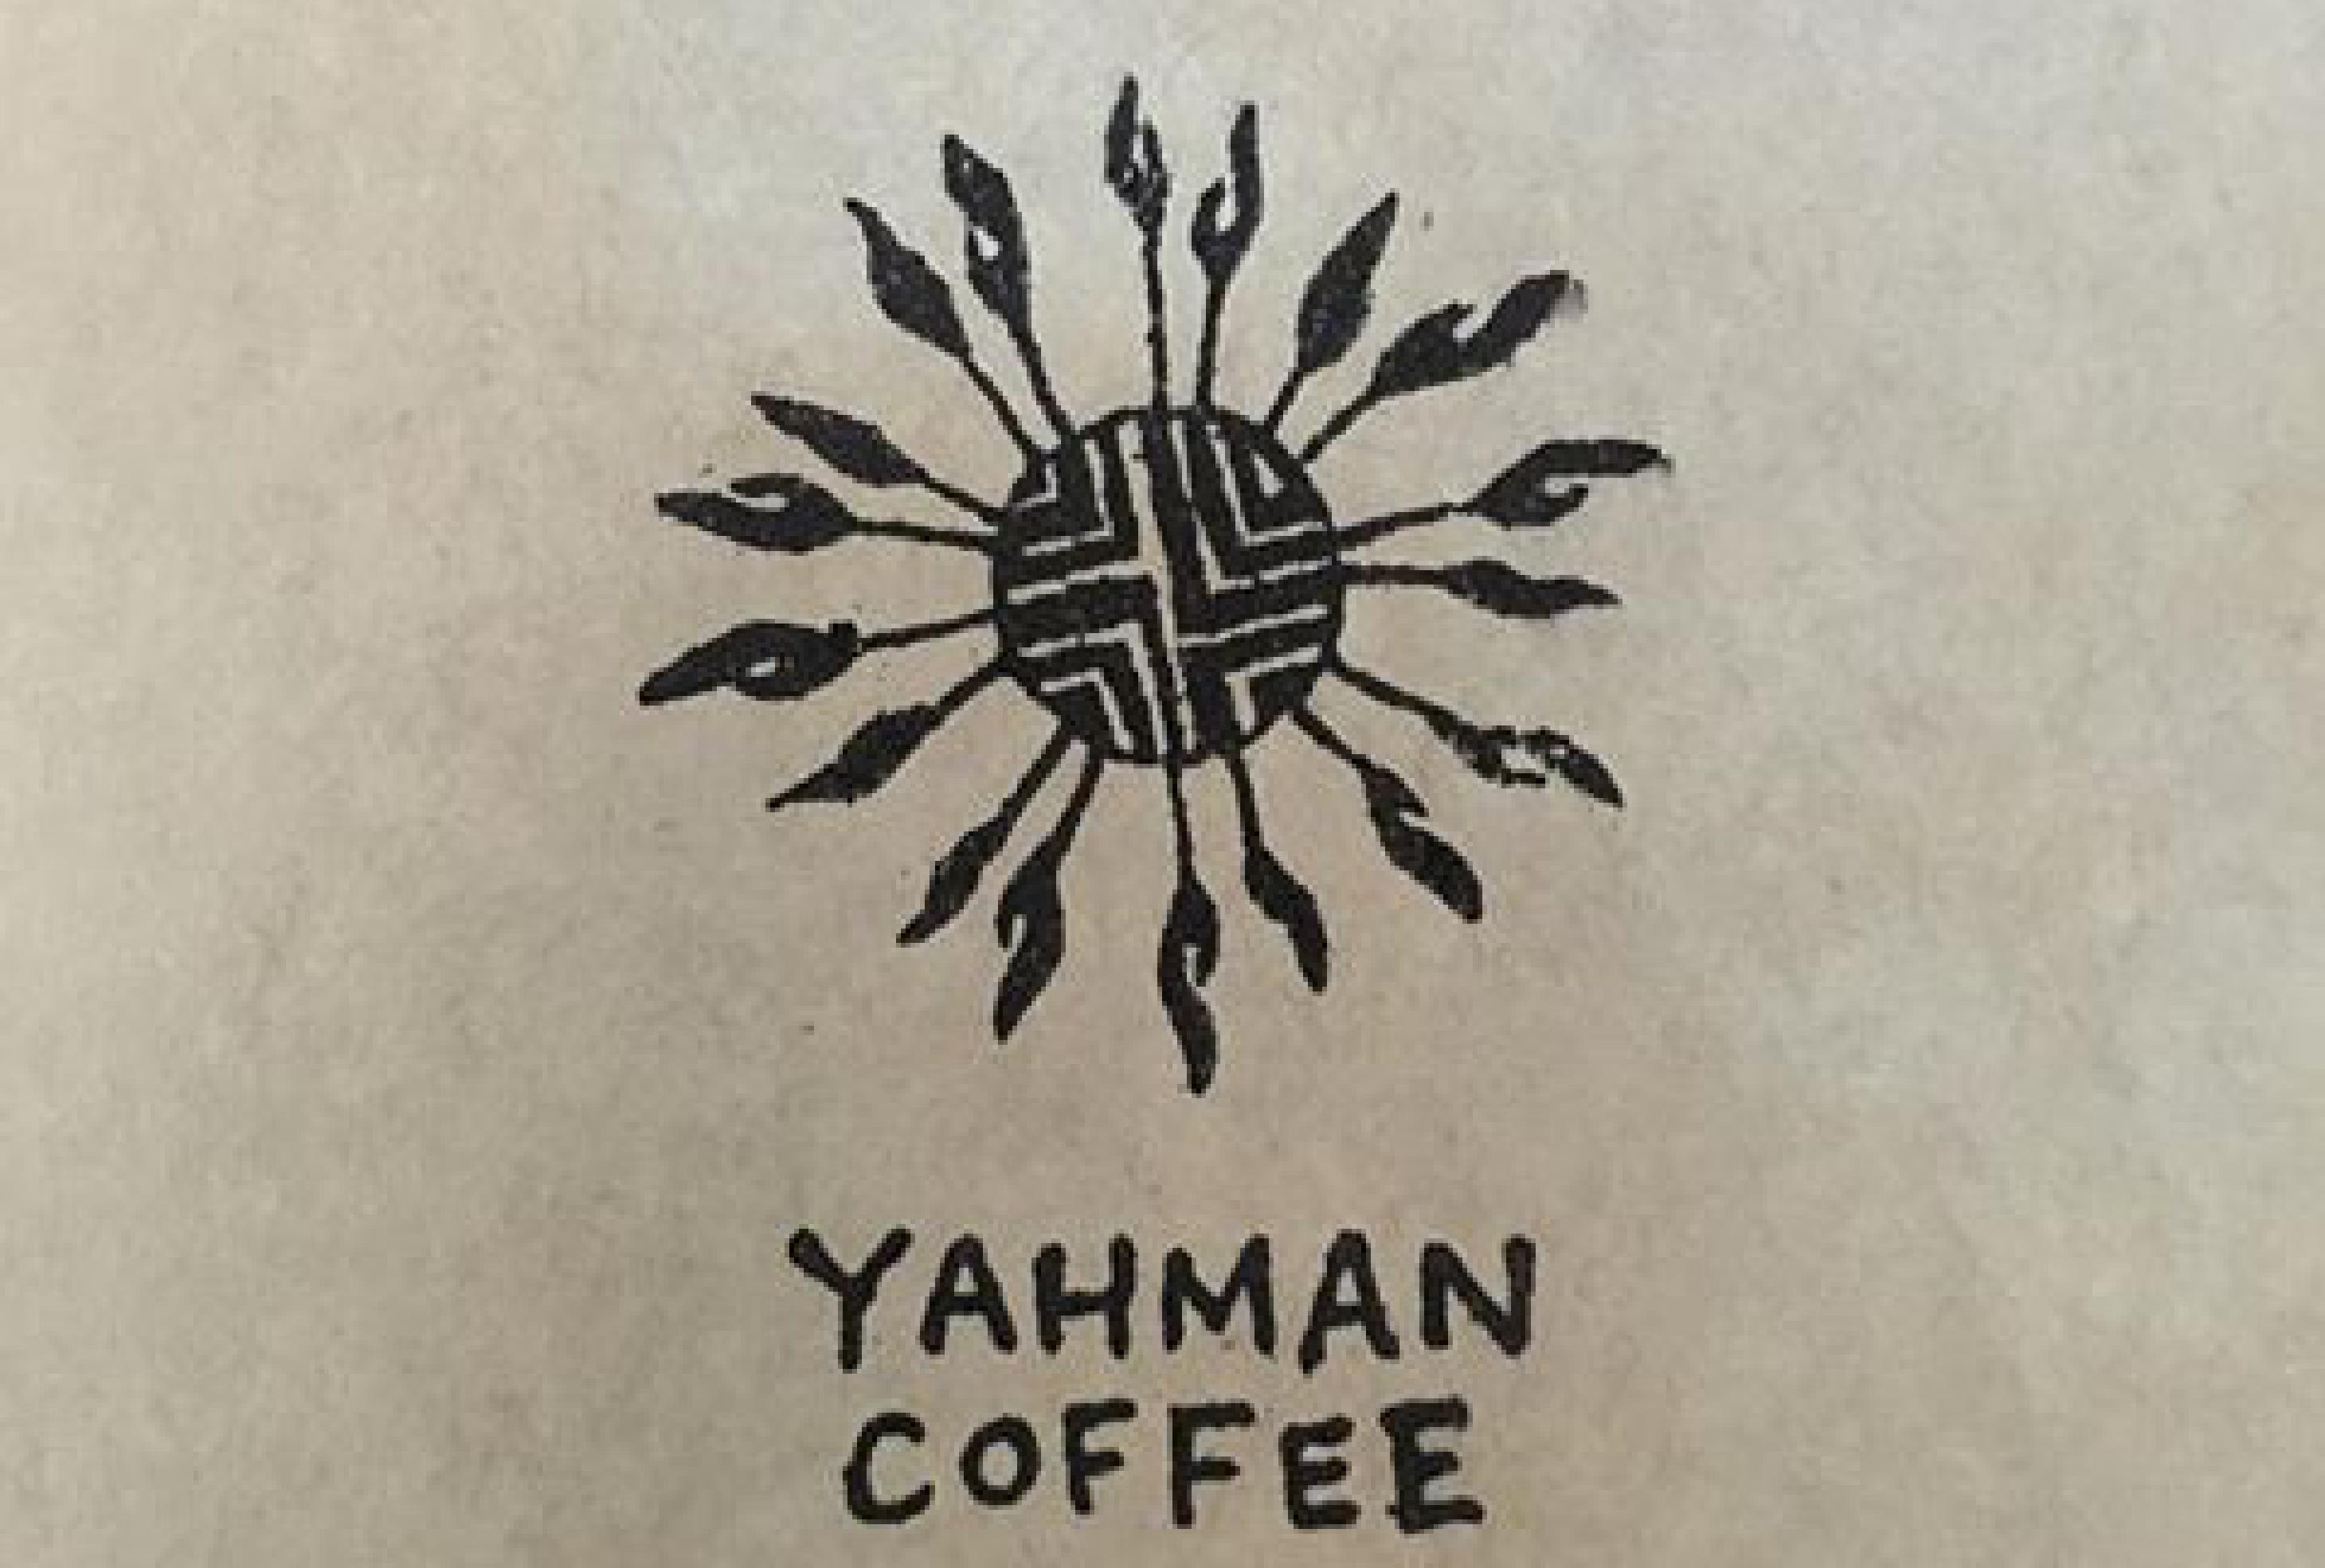 Yahman Coffee